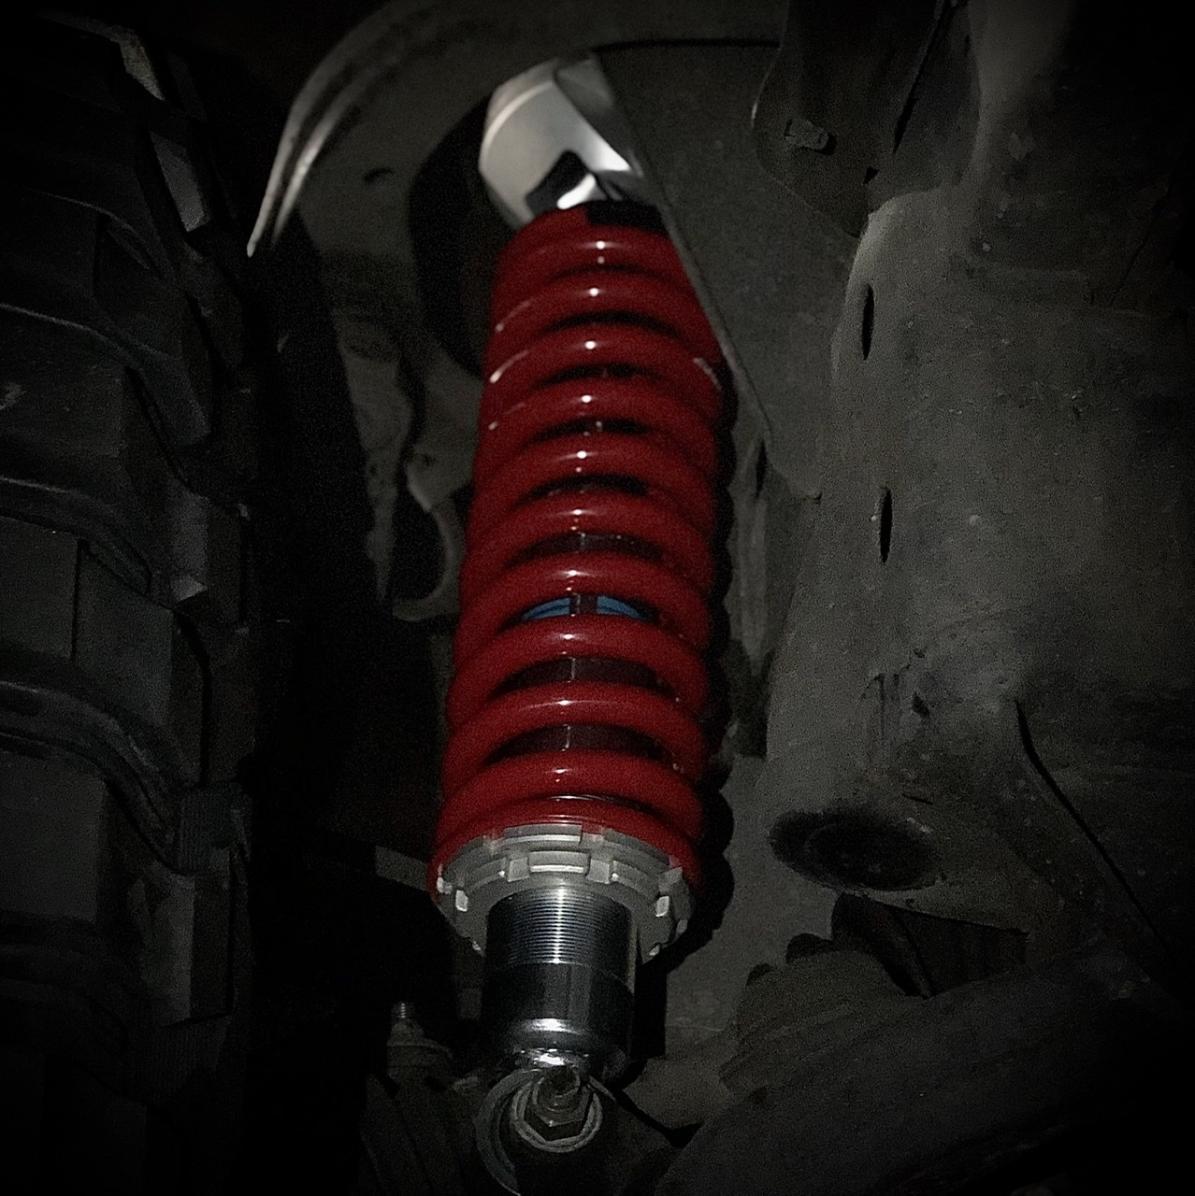 Formidable 2002 Thundercloud Sport TRD Supercharged Version 2.0-ca44db4b-d315-4839-a964-57a472ceb4fb-jpg